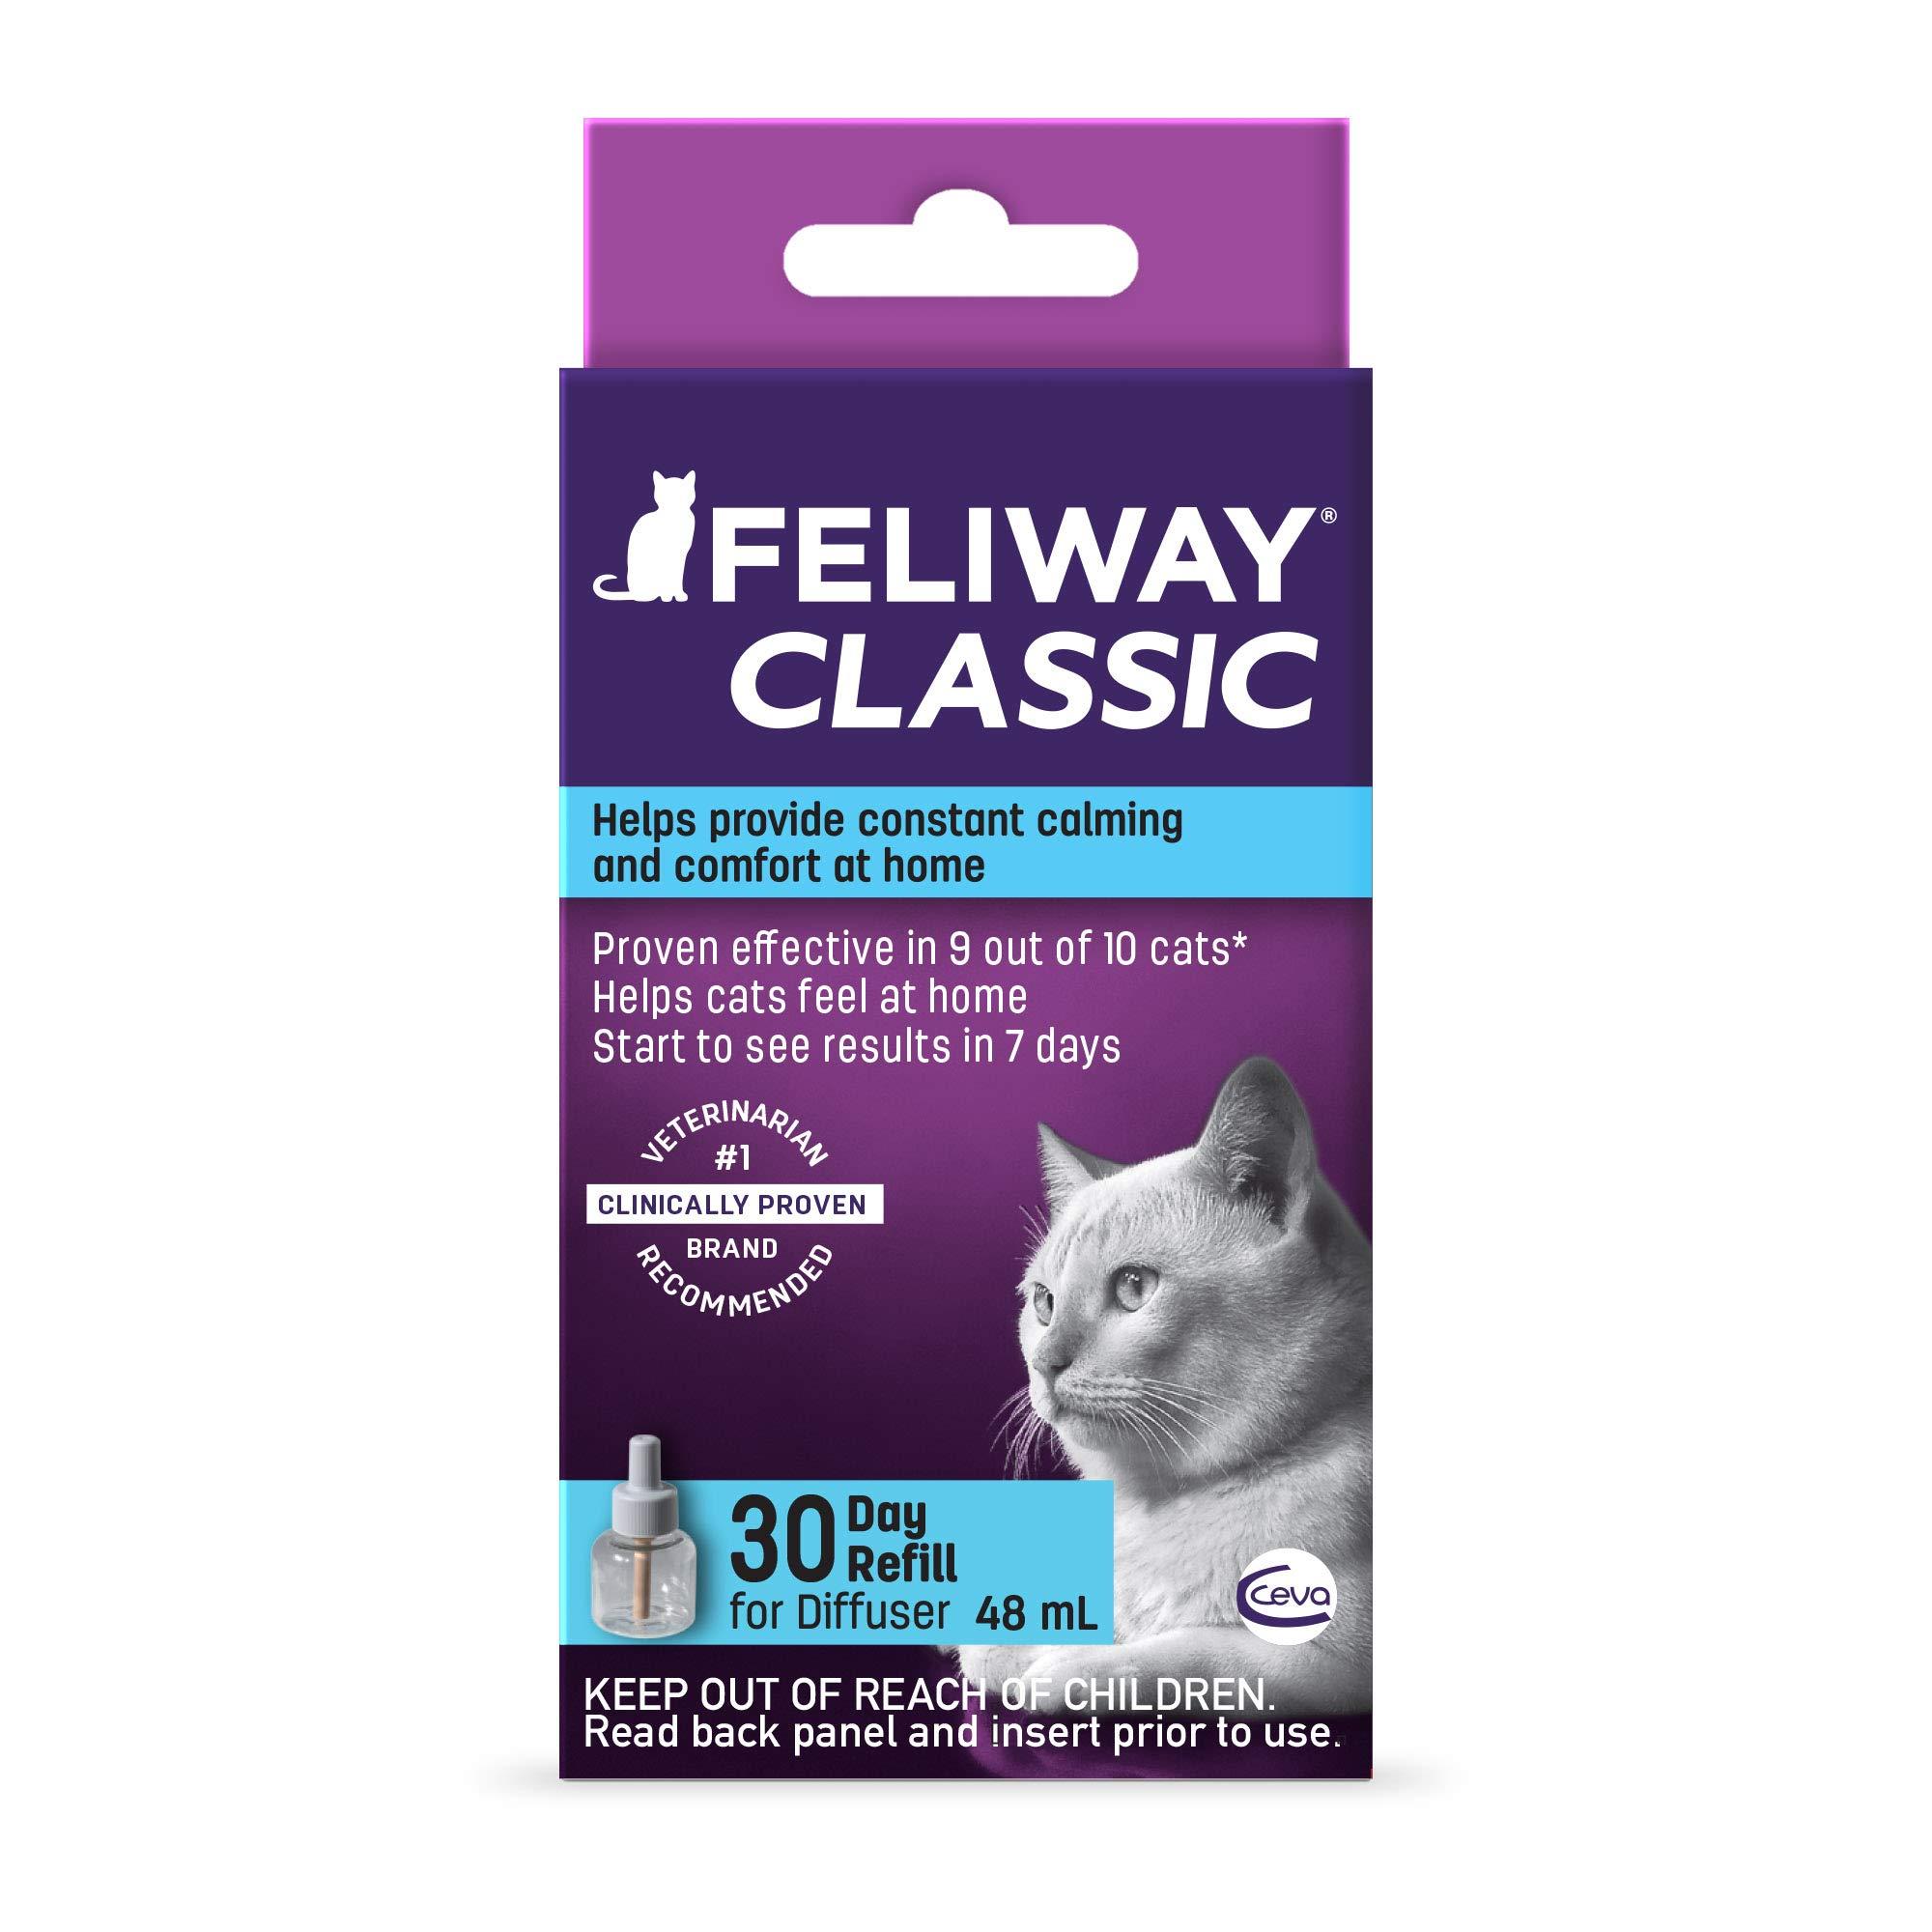 Feliway Classic Diffuser Refill for Cats | Constant Calming & Comfort At Home